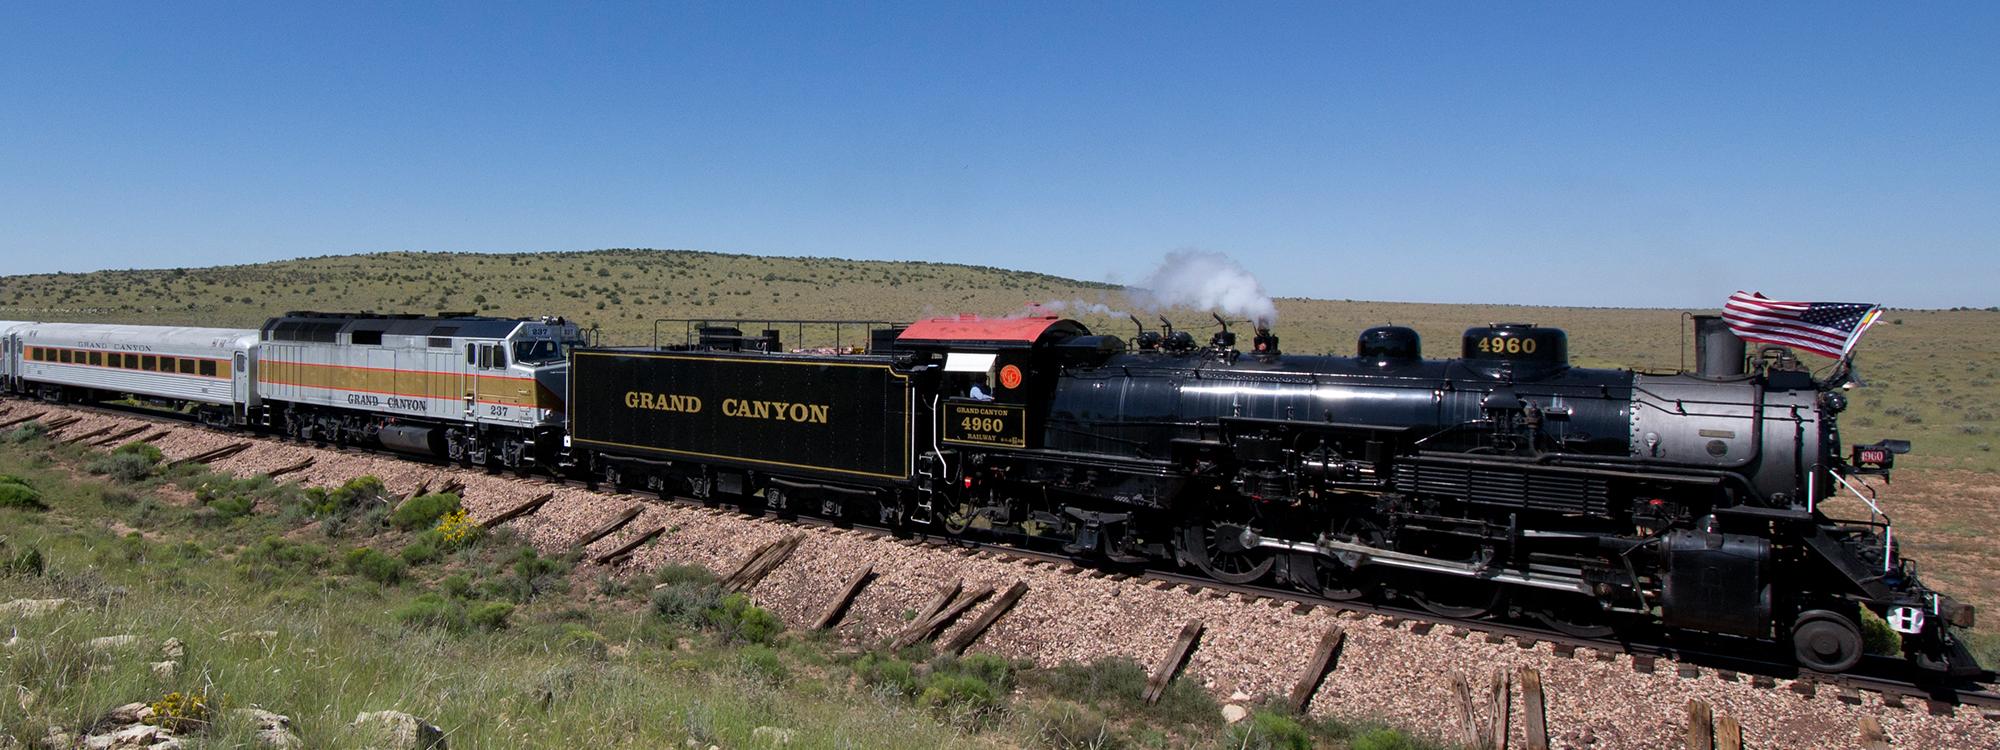 Grand canyon railway discount coupons